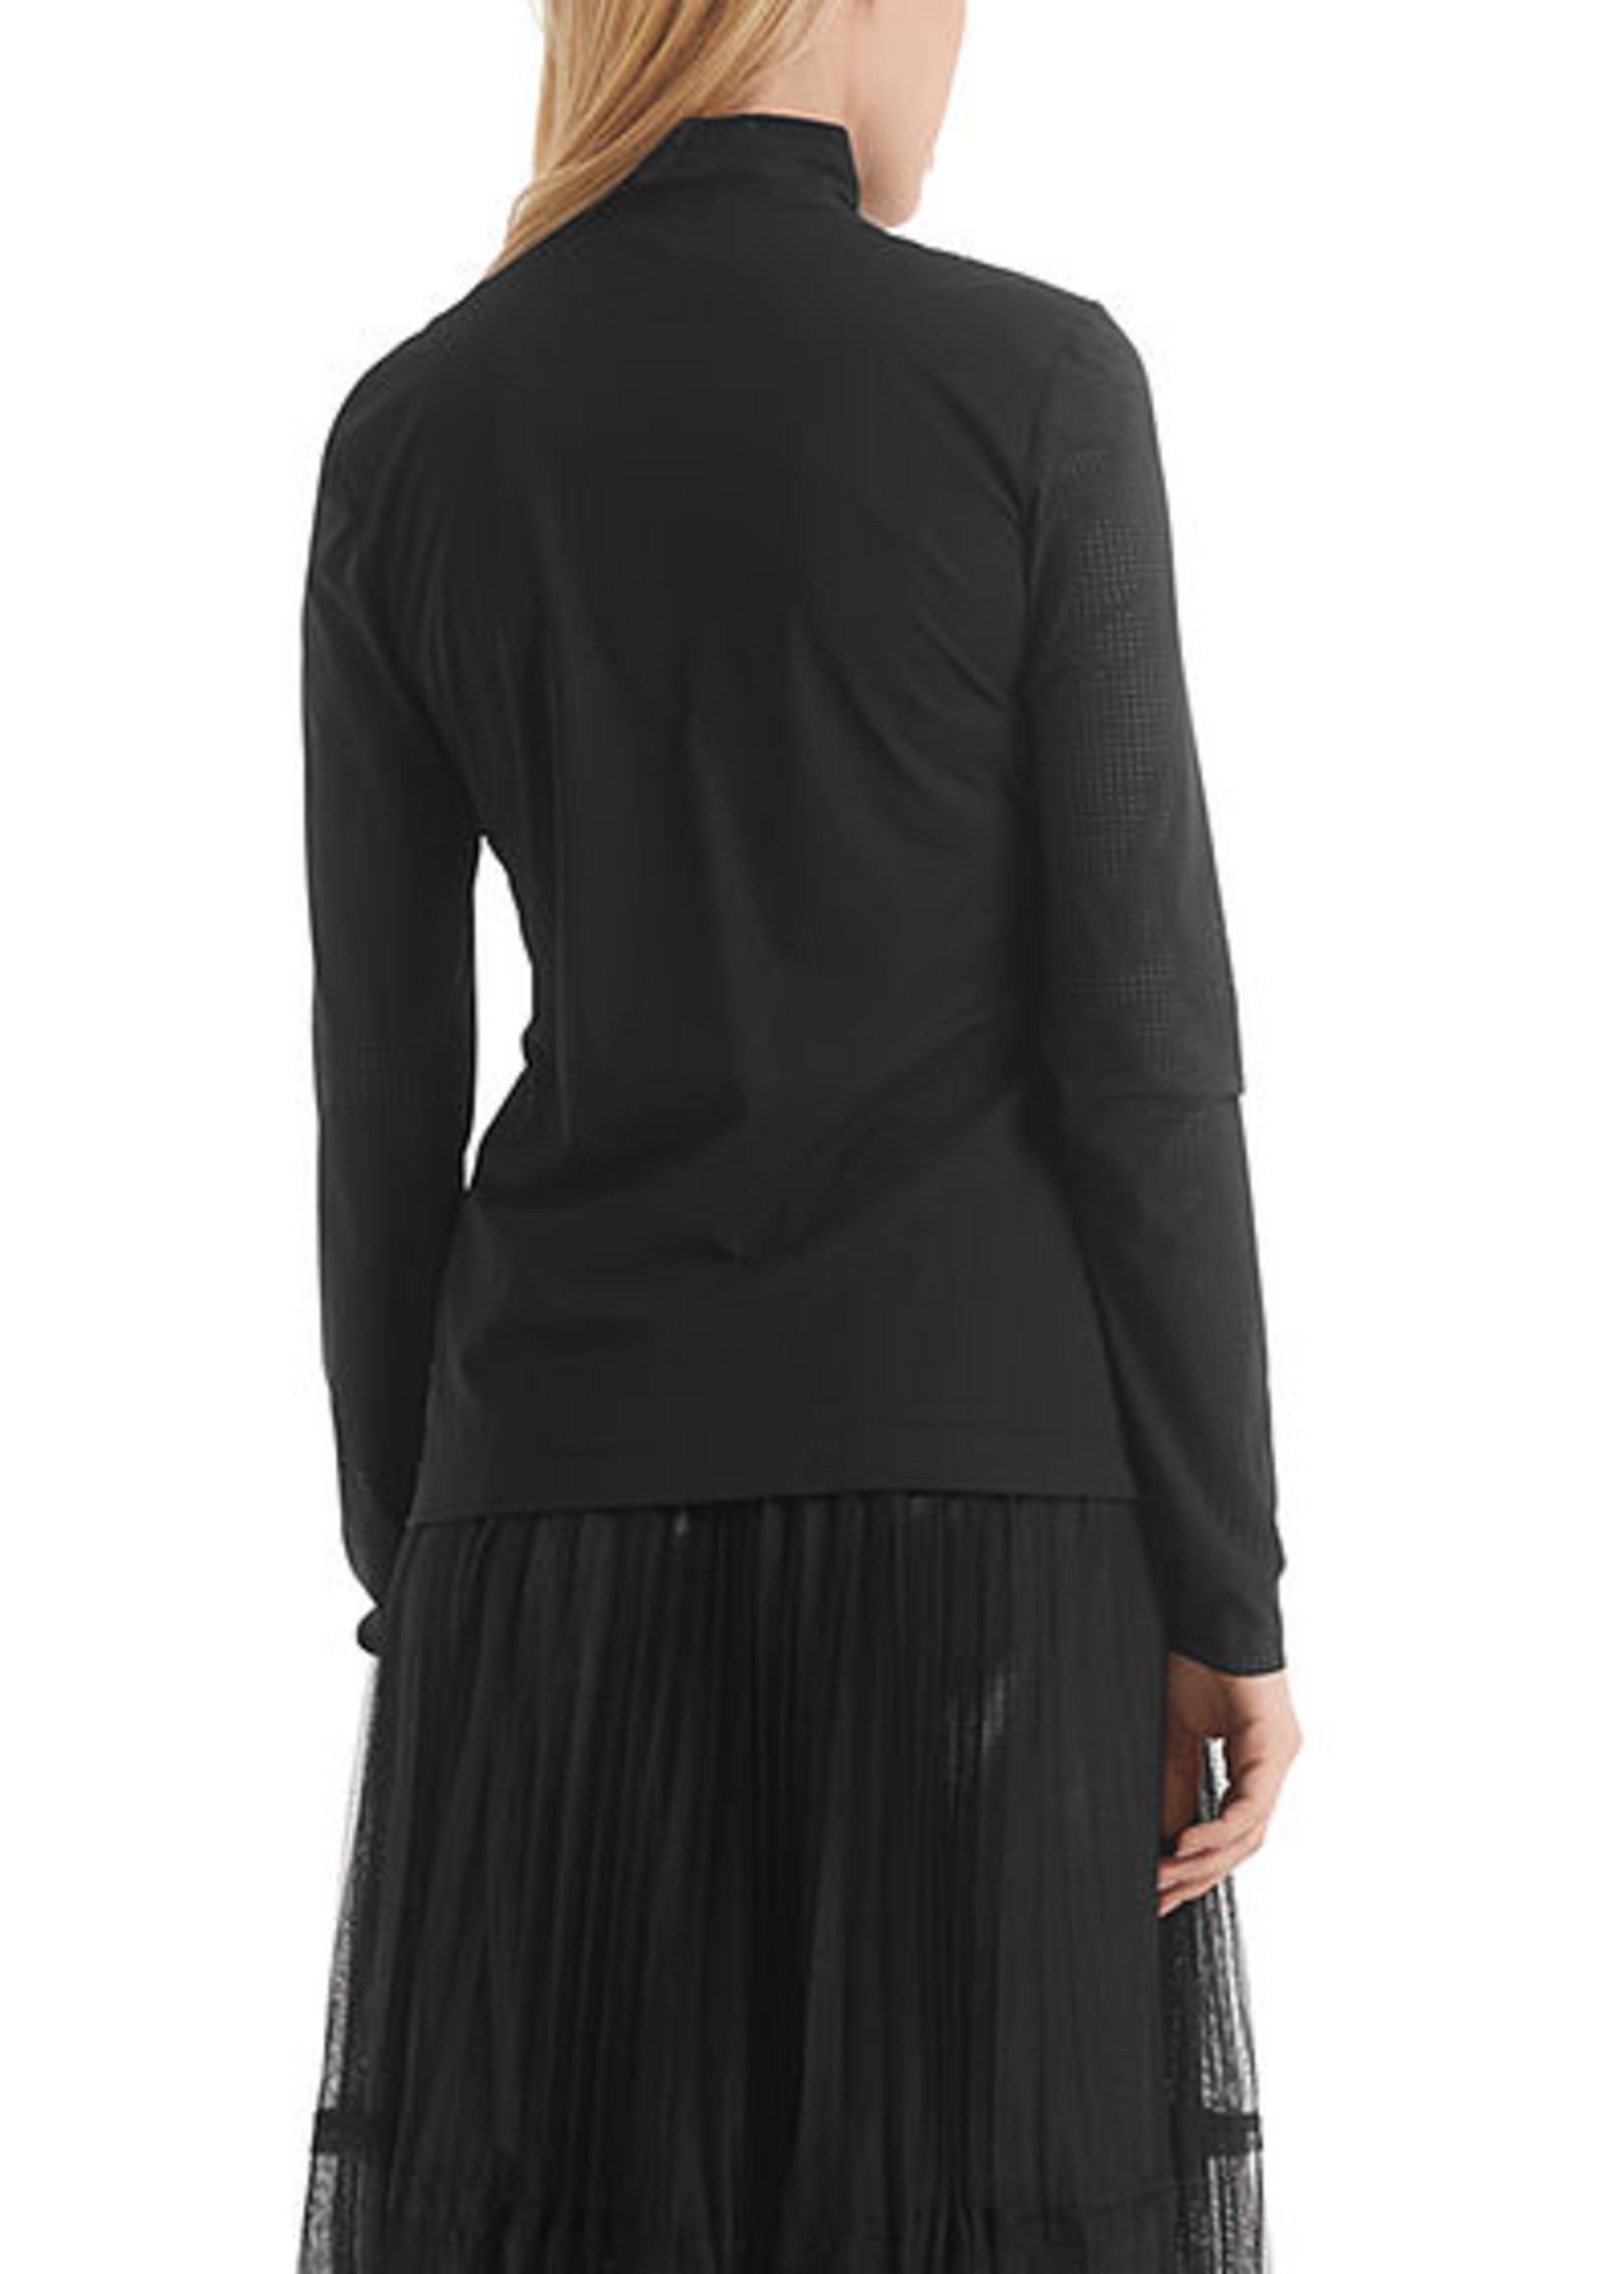 Marccain Sports T-shirt RS 48.15 J02 black